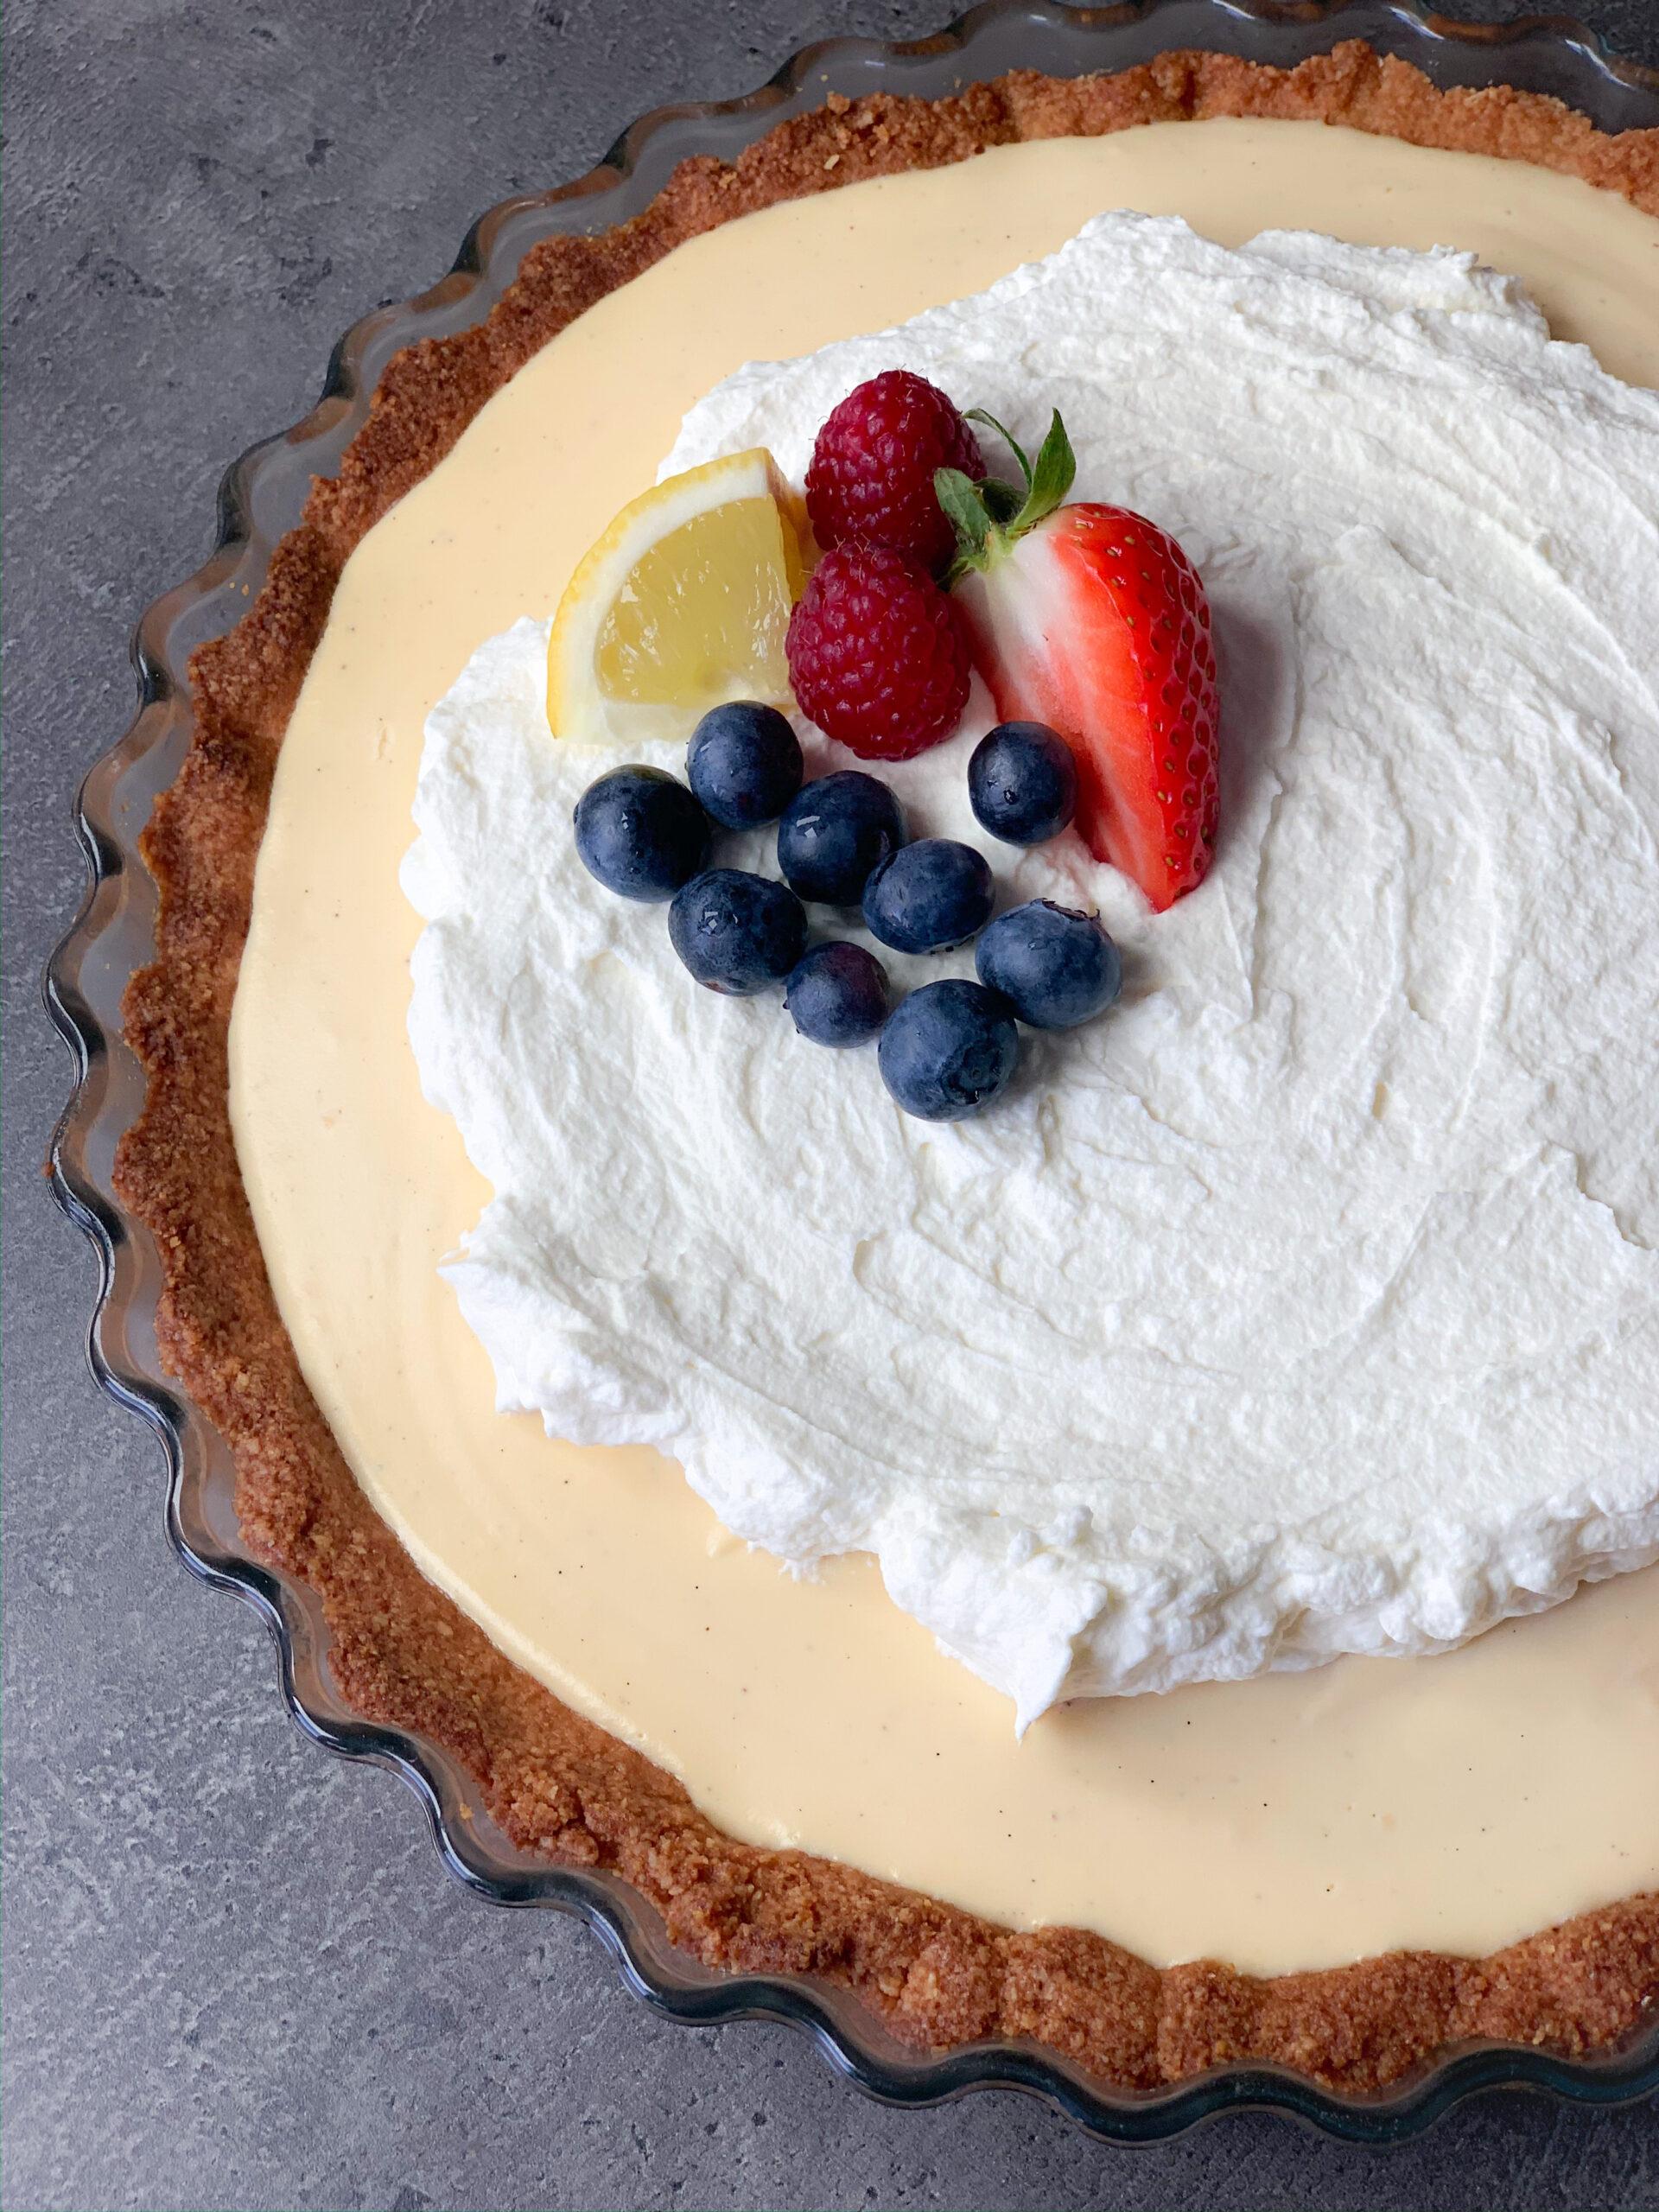 Picture of keto lemon cream tart with crispy keto pie crust